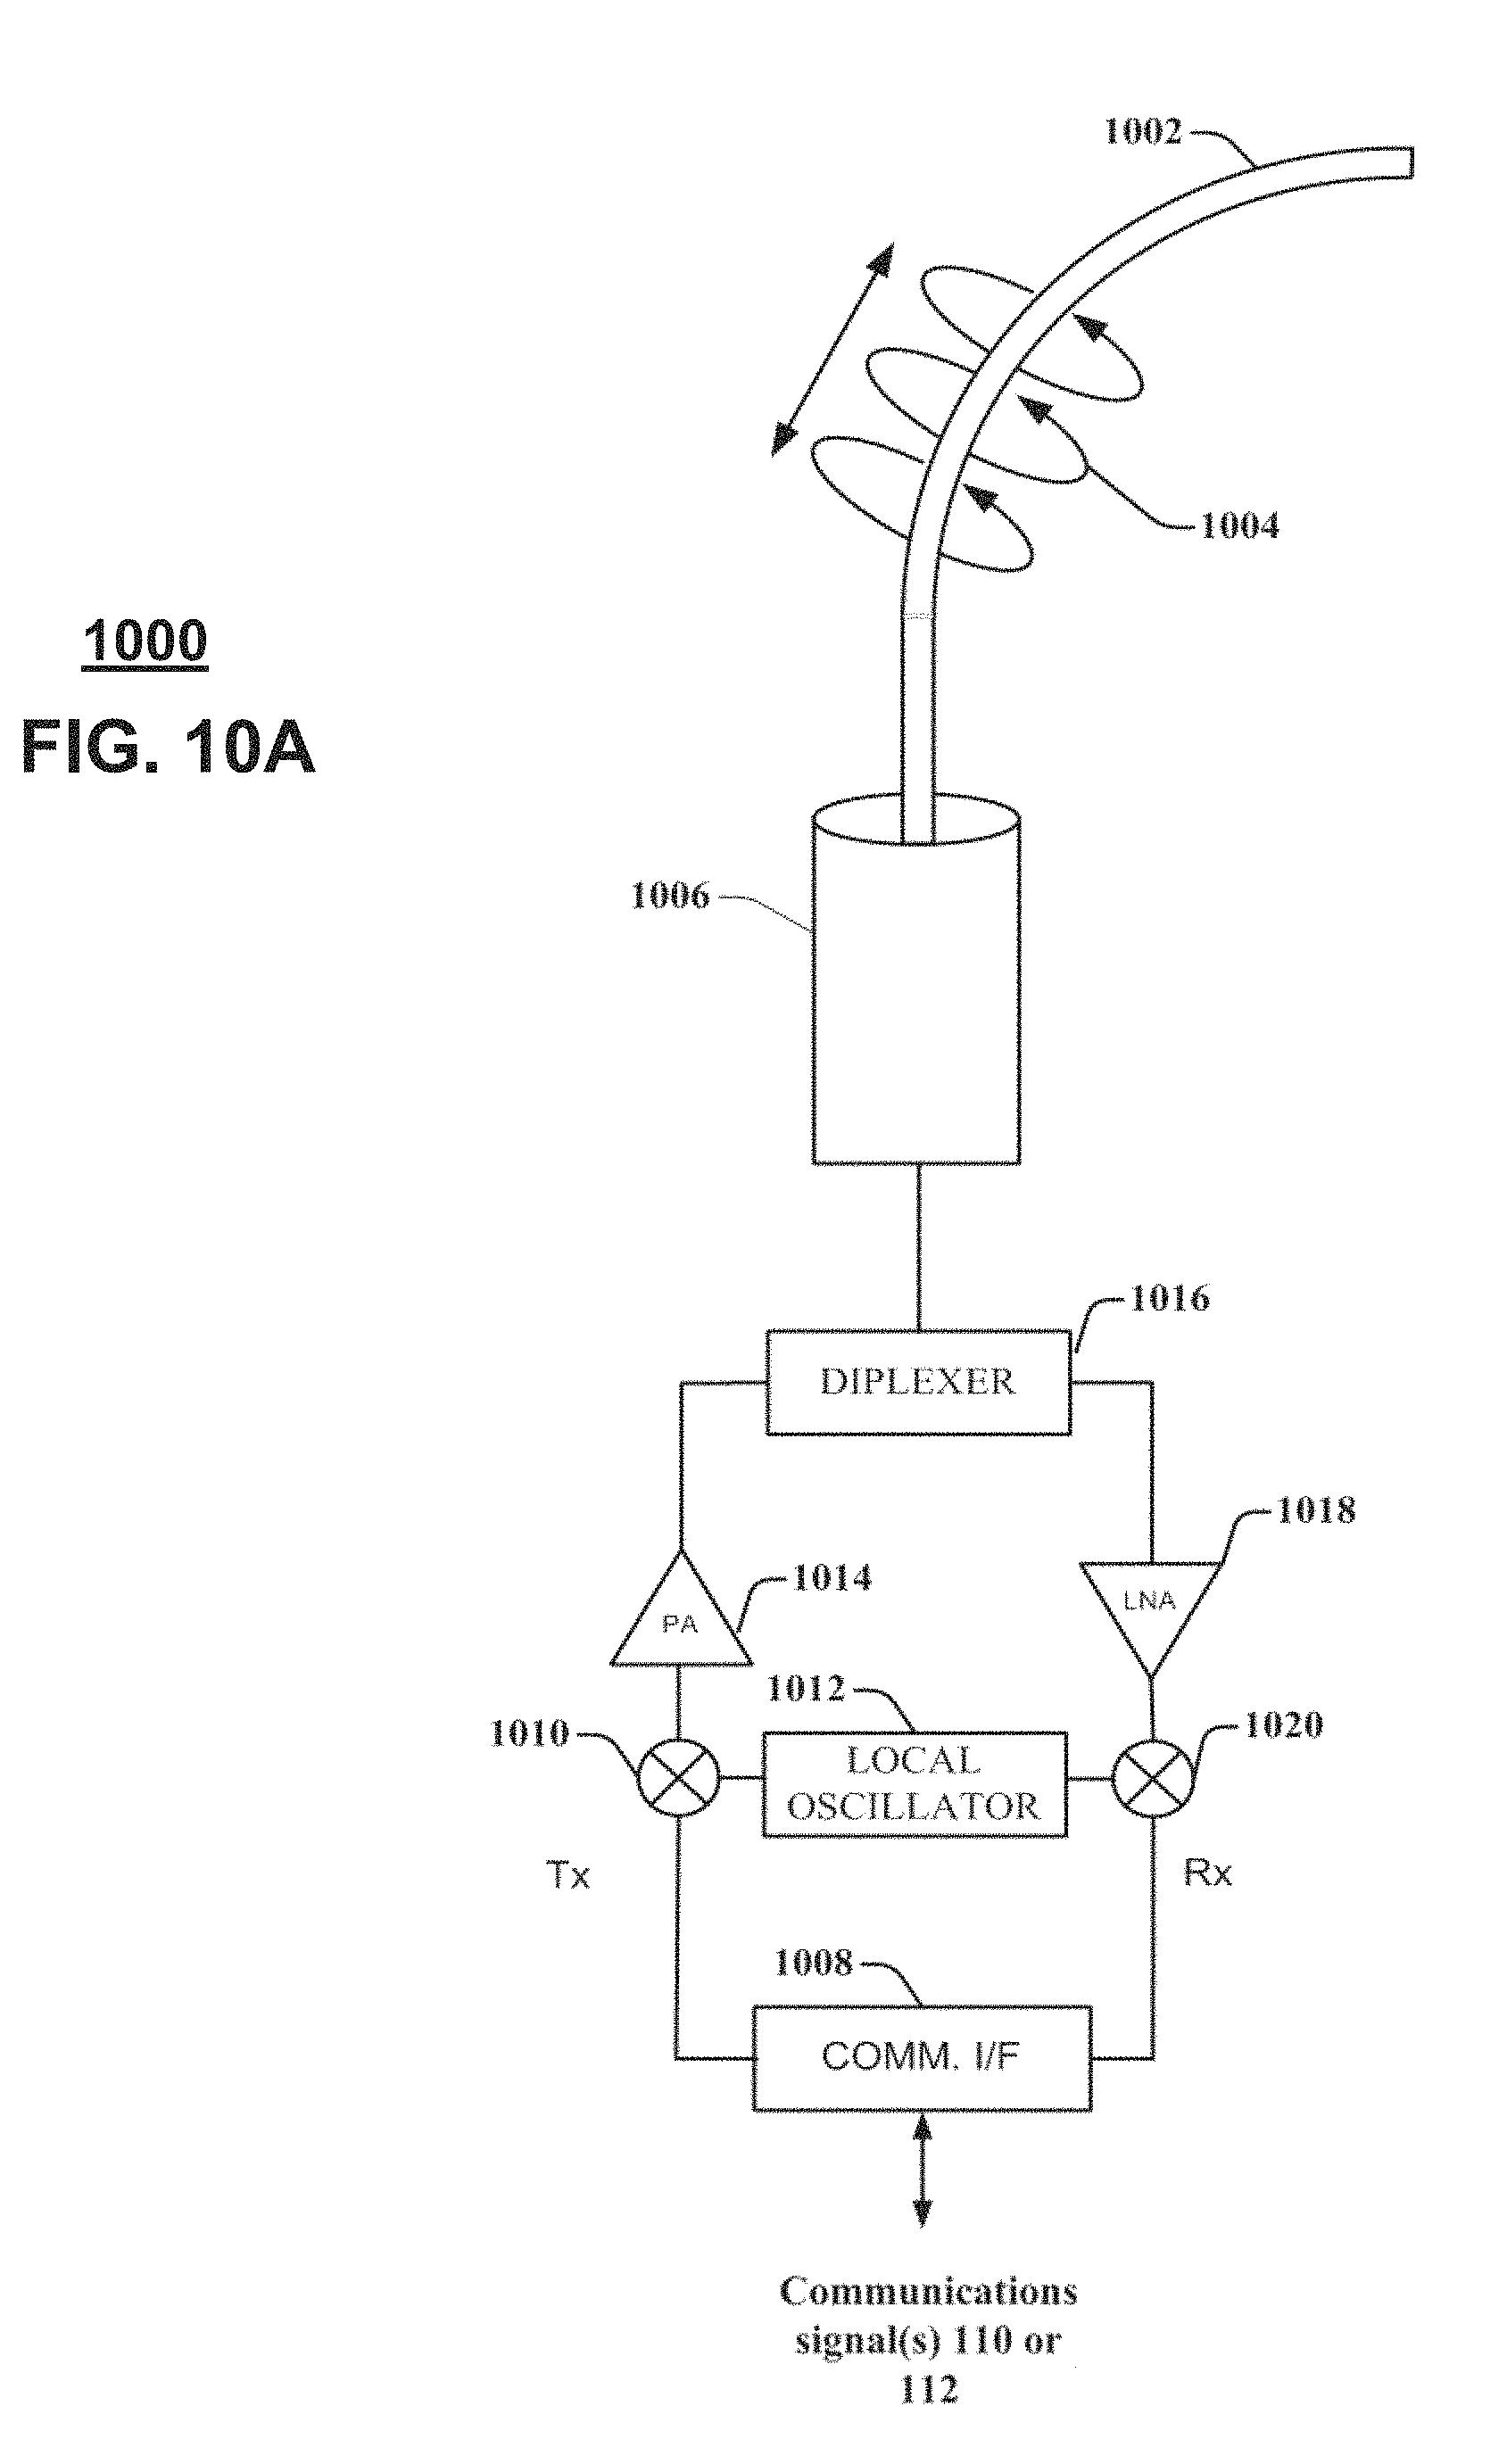 Patent US 9,882,257 B2